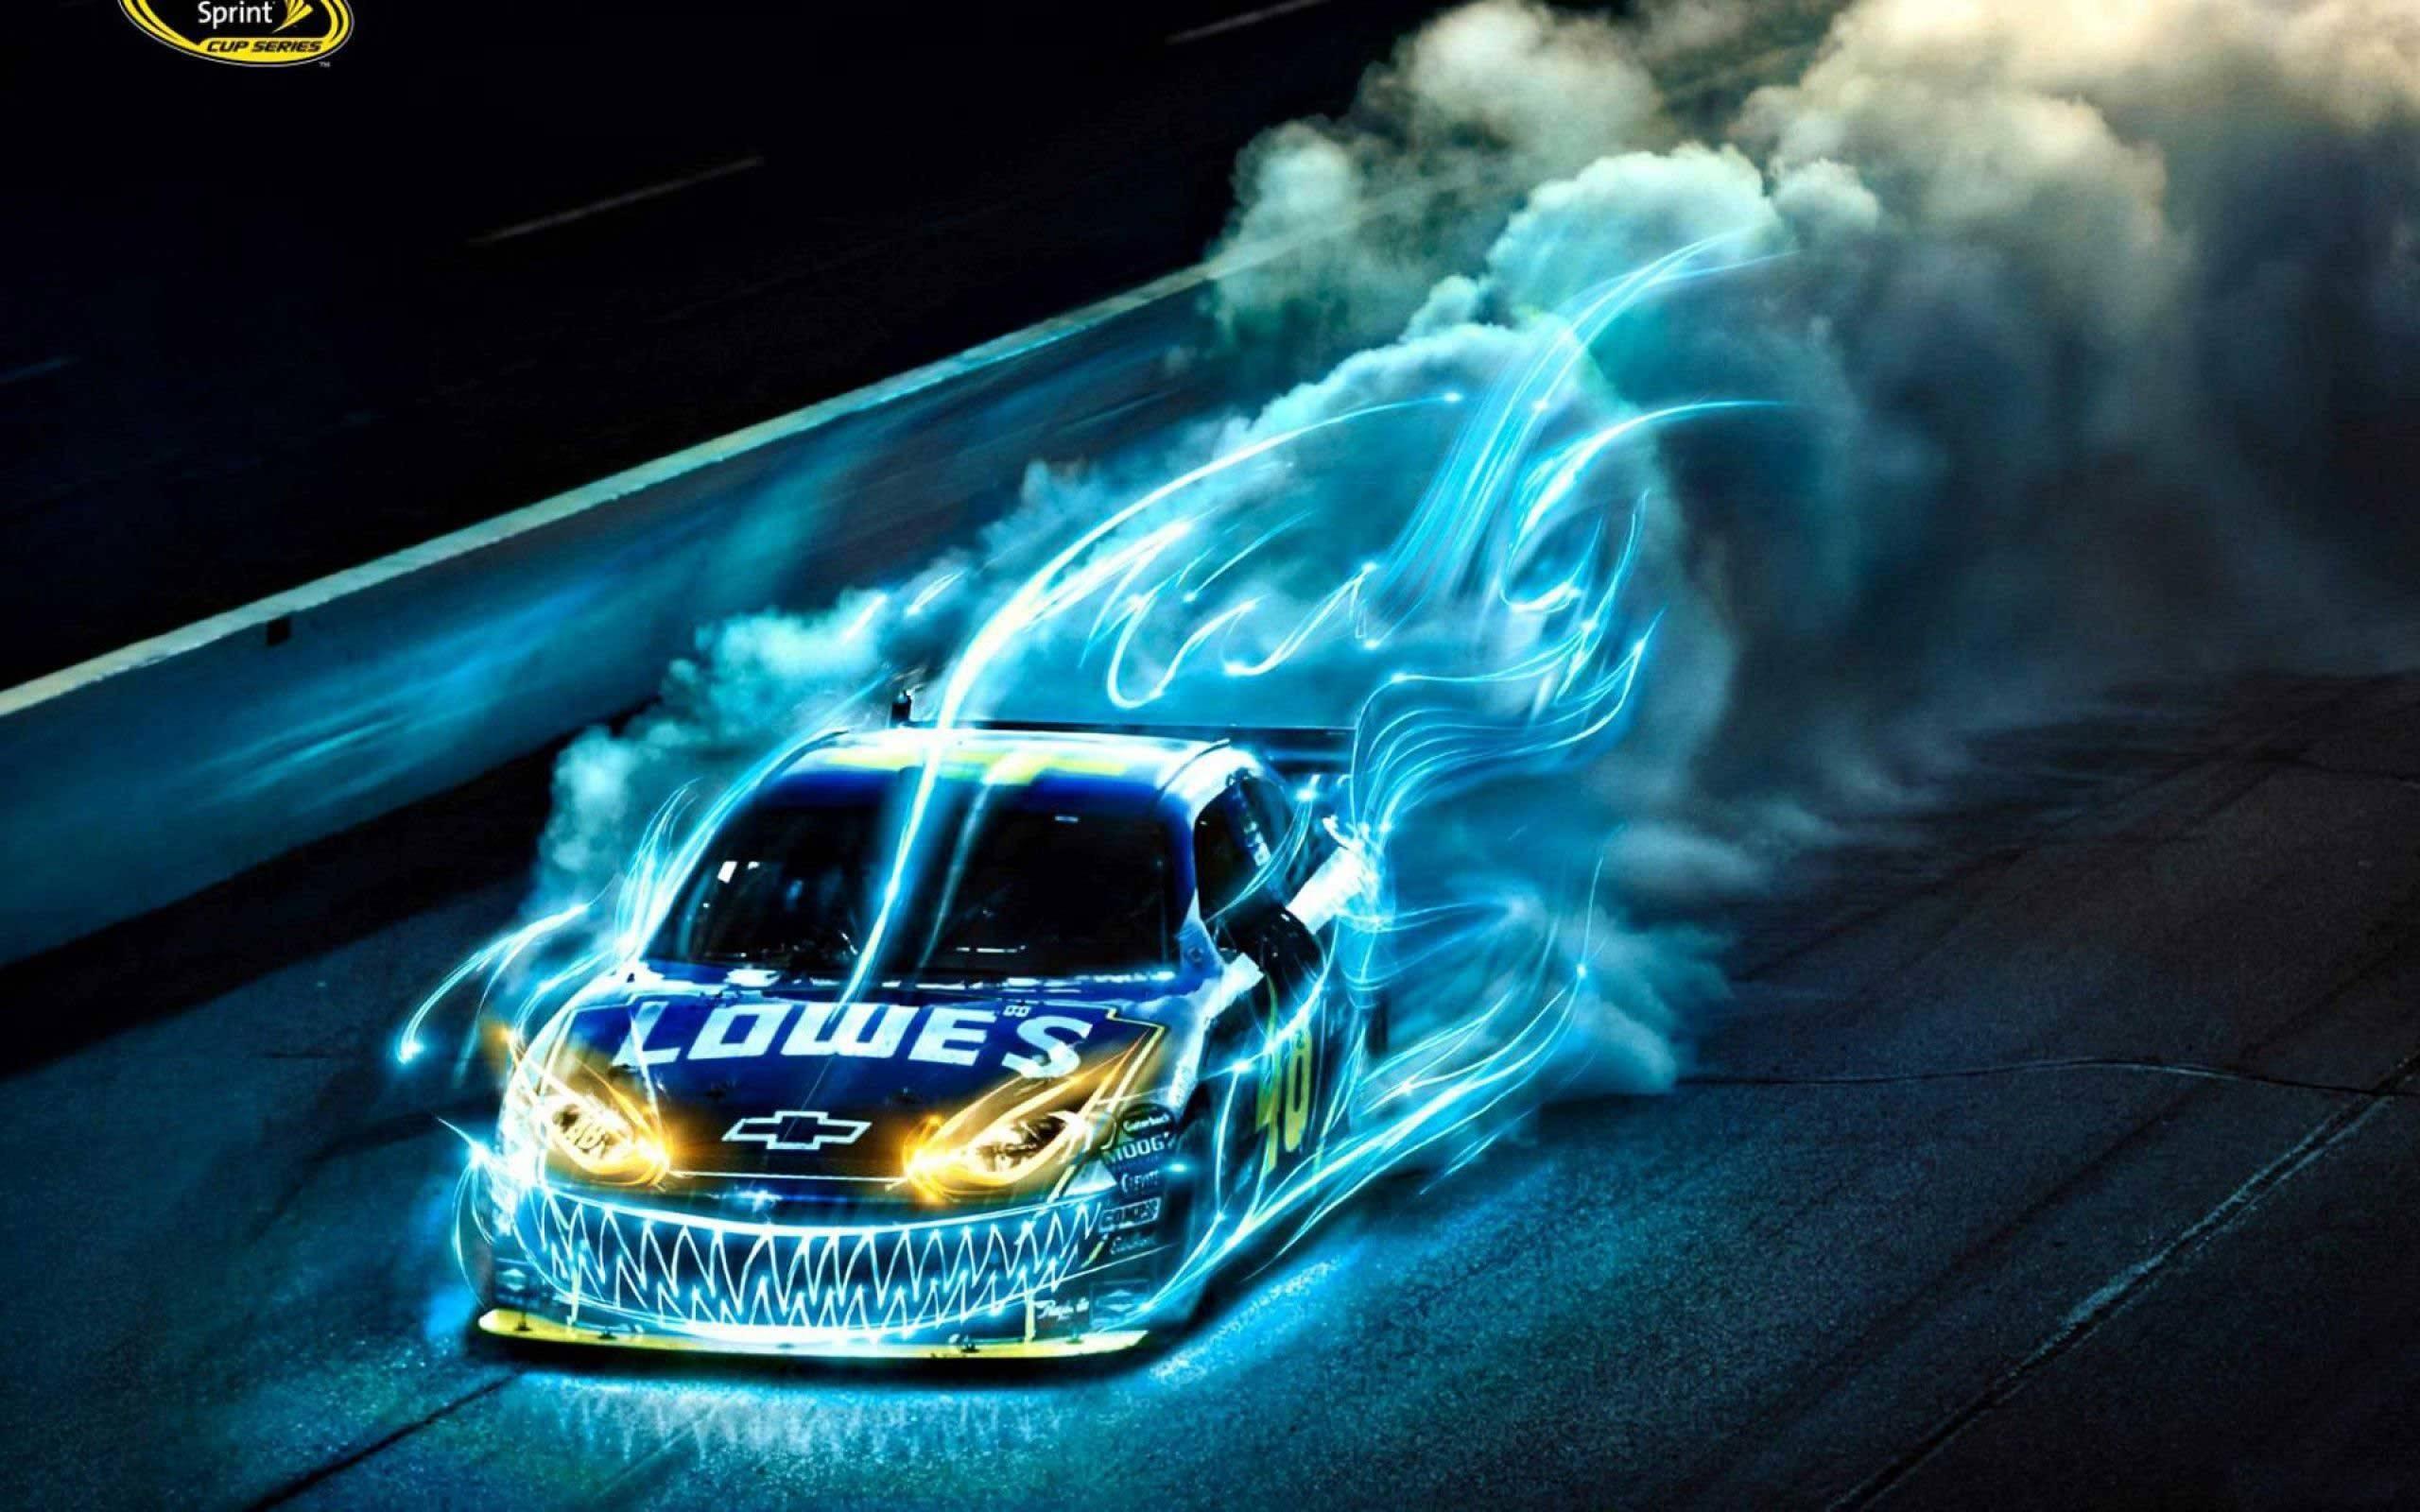 gorgerous car desktop wallpaper for samsung